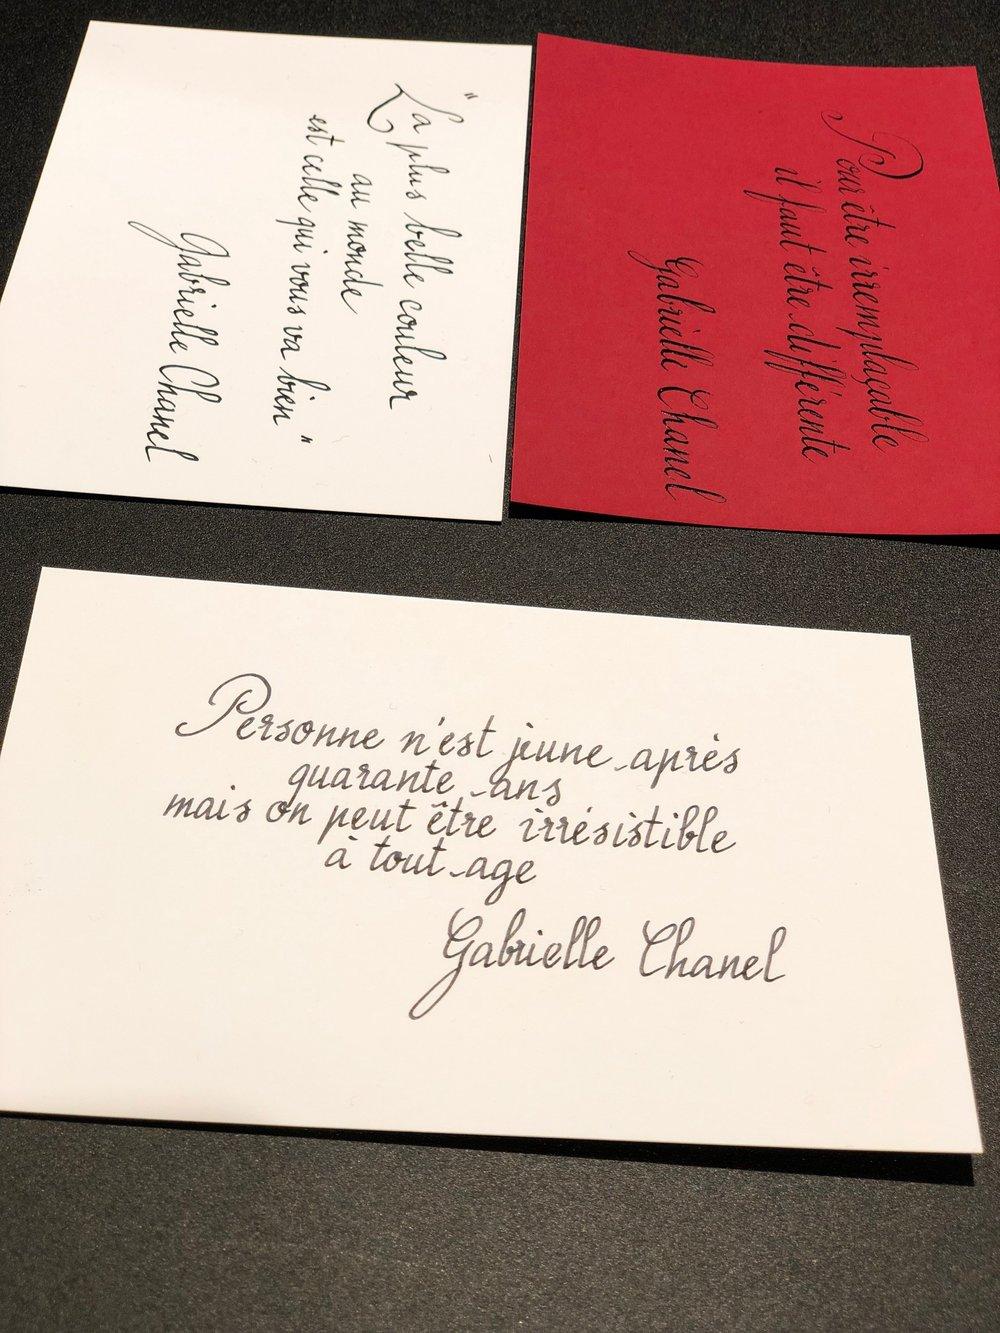 Chanel-le-rouge-elisa-les-bons-tuyaux-4.JPG